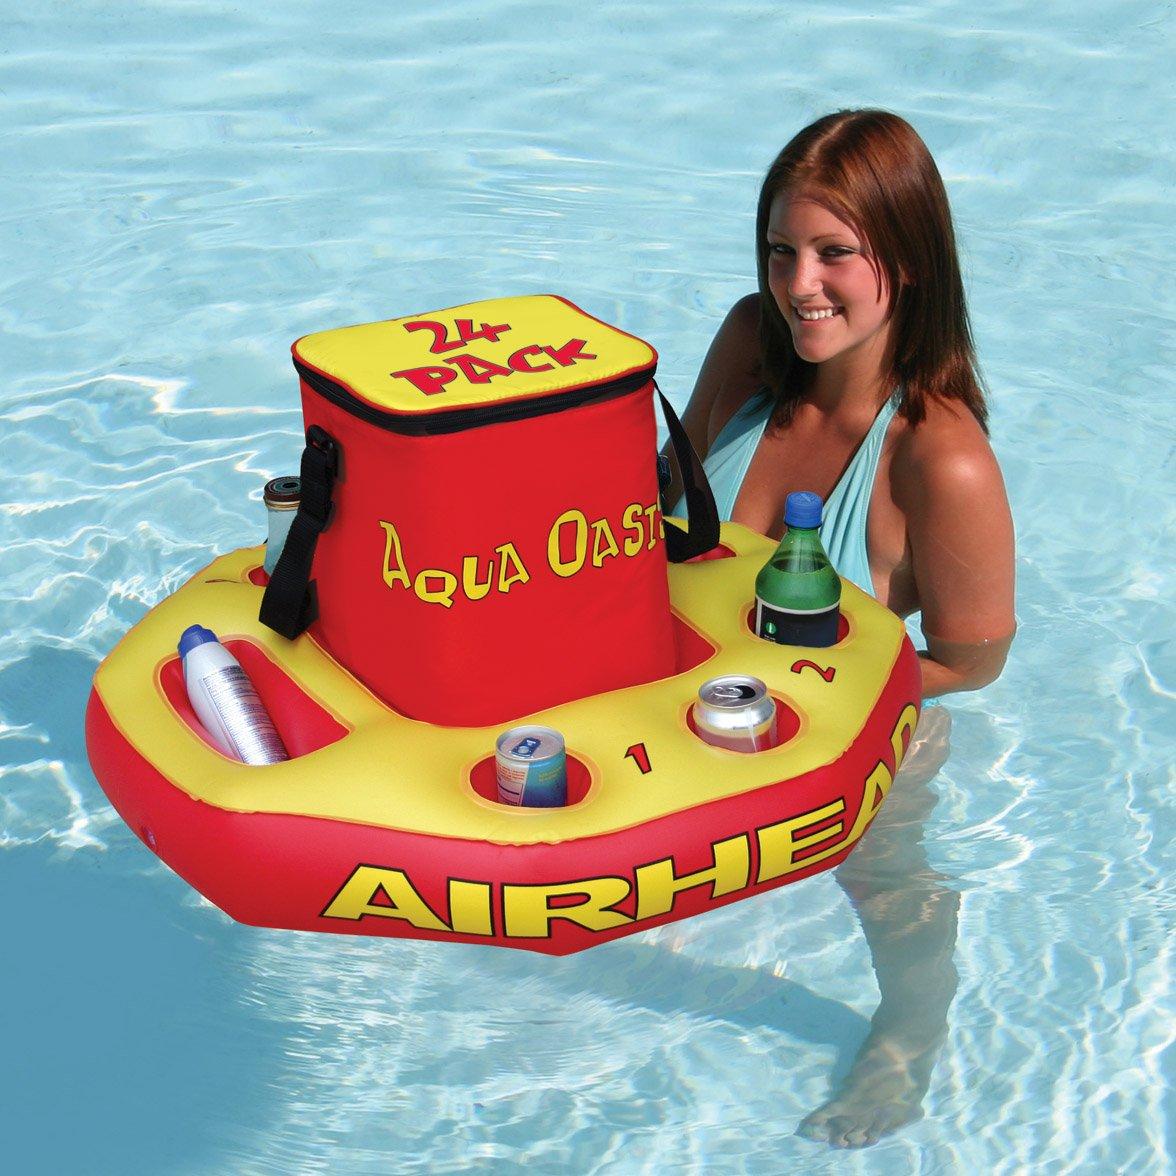 Airhead Watersports Airhead Aqua Oasis Floating Cooler